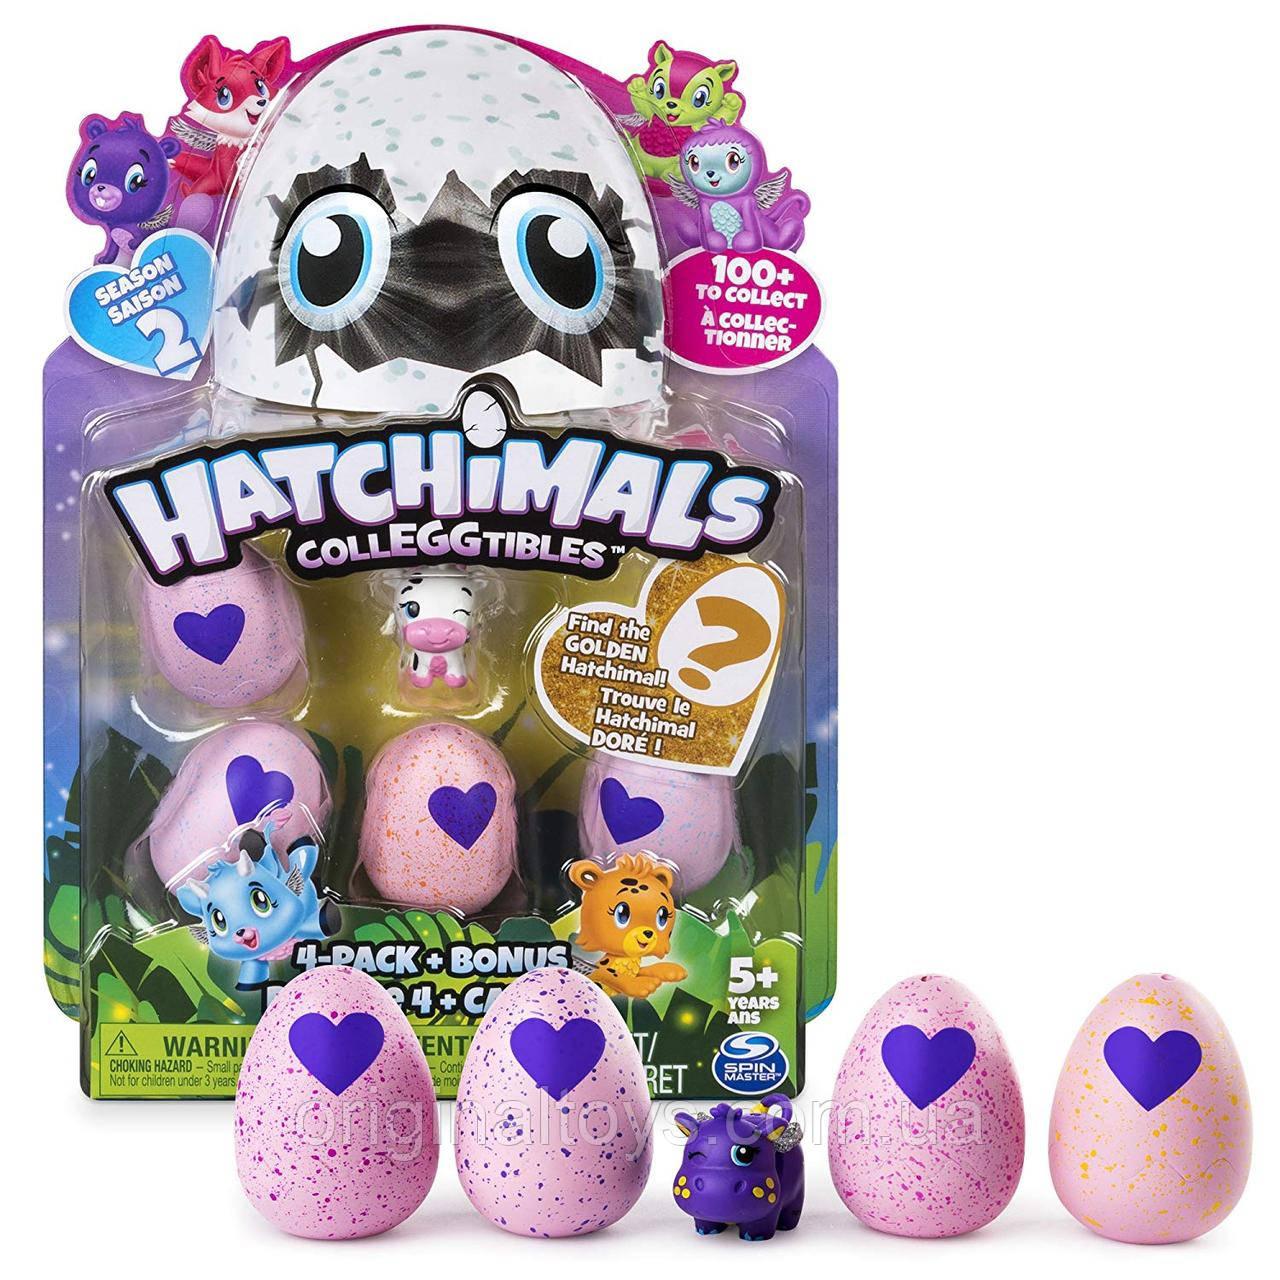 Набор игрушек Hatchimals Colleggtibles 4 фигурки + бонус 2 сезон